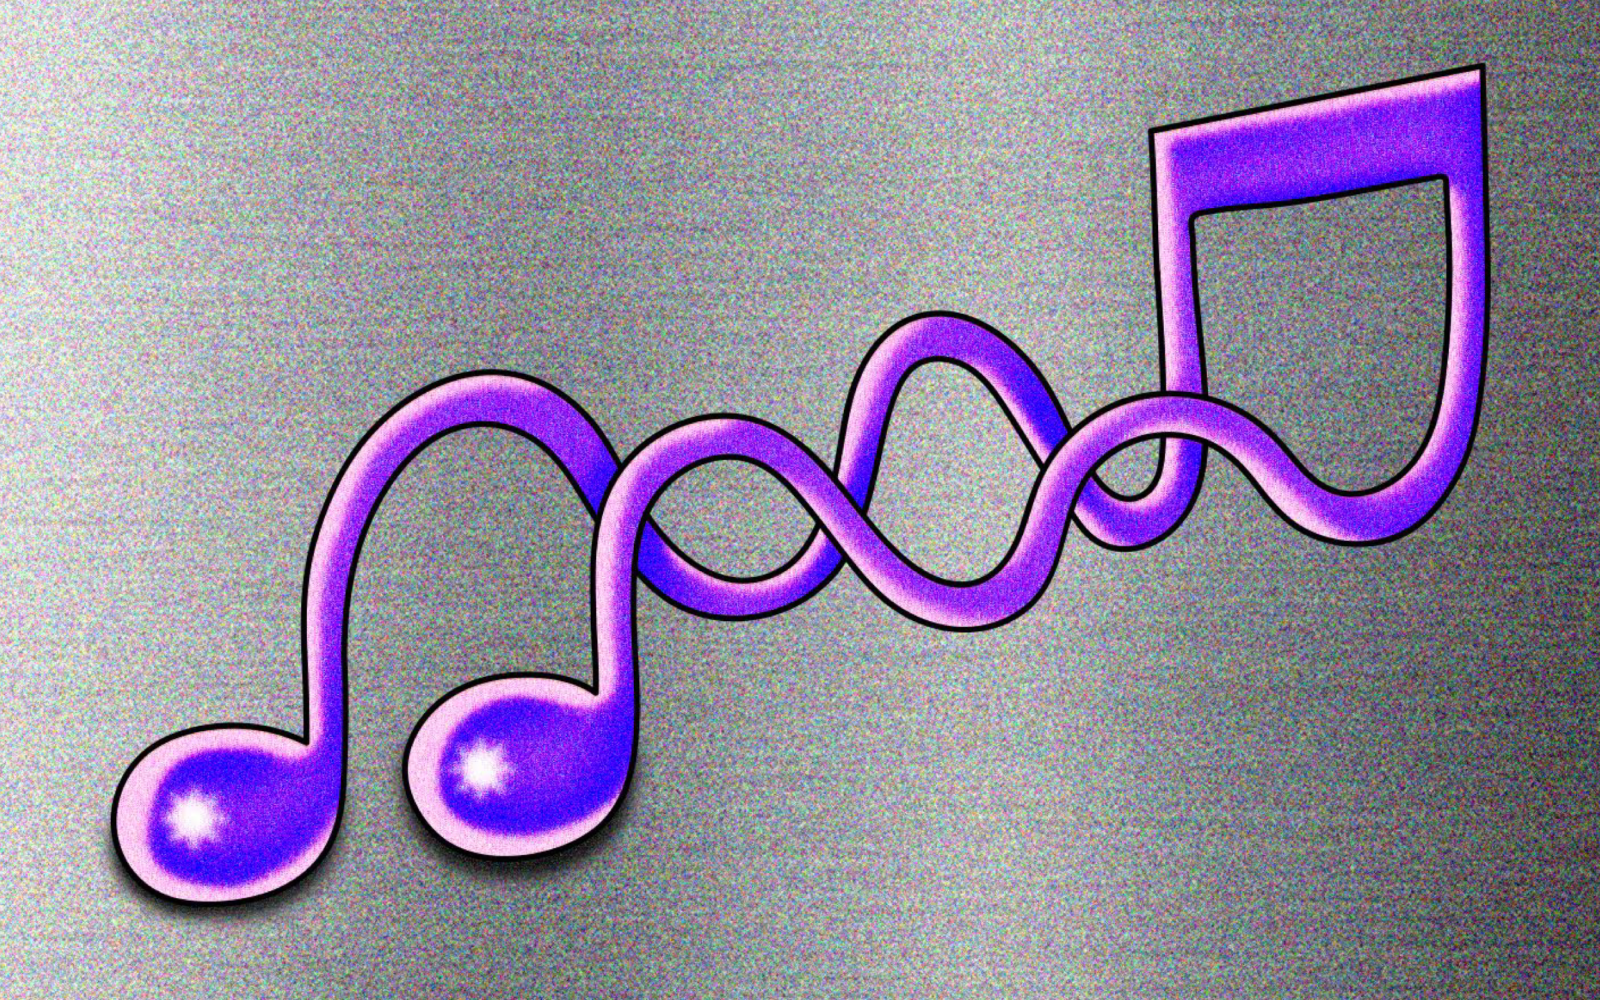 Mastering for SoundCloud using iZotope's Ozone 8 - Blog | Splice